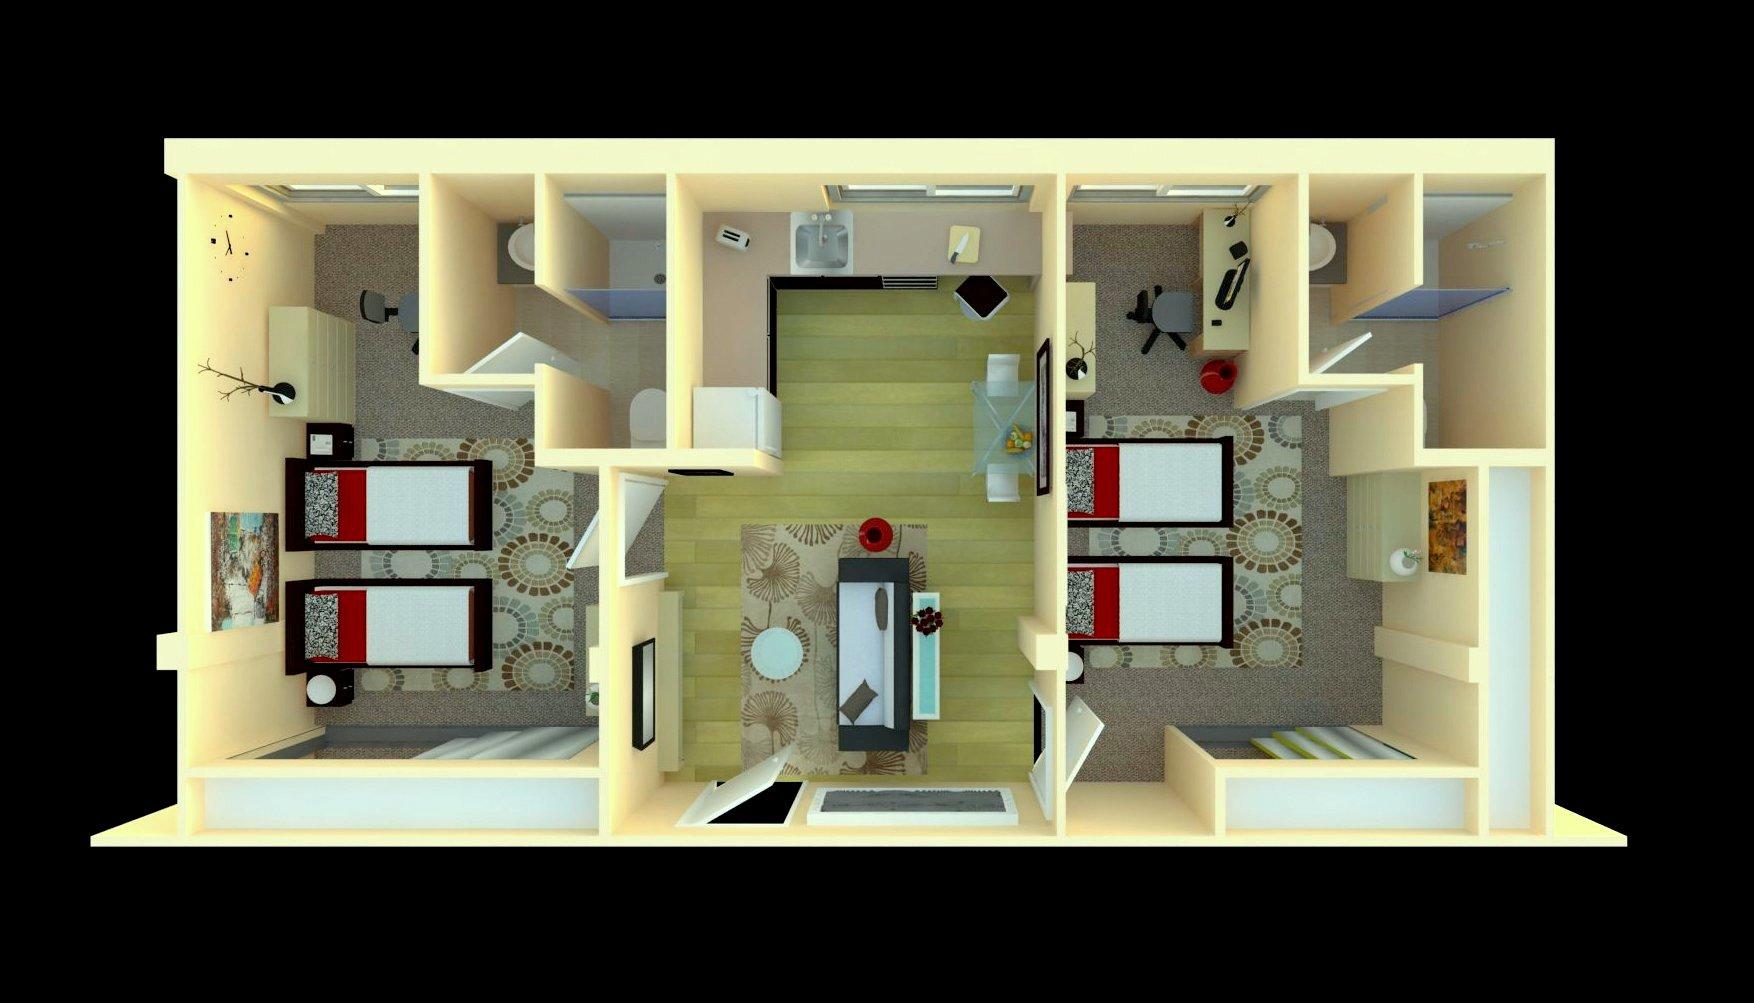 A little dorm room fun 8